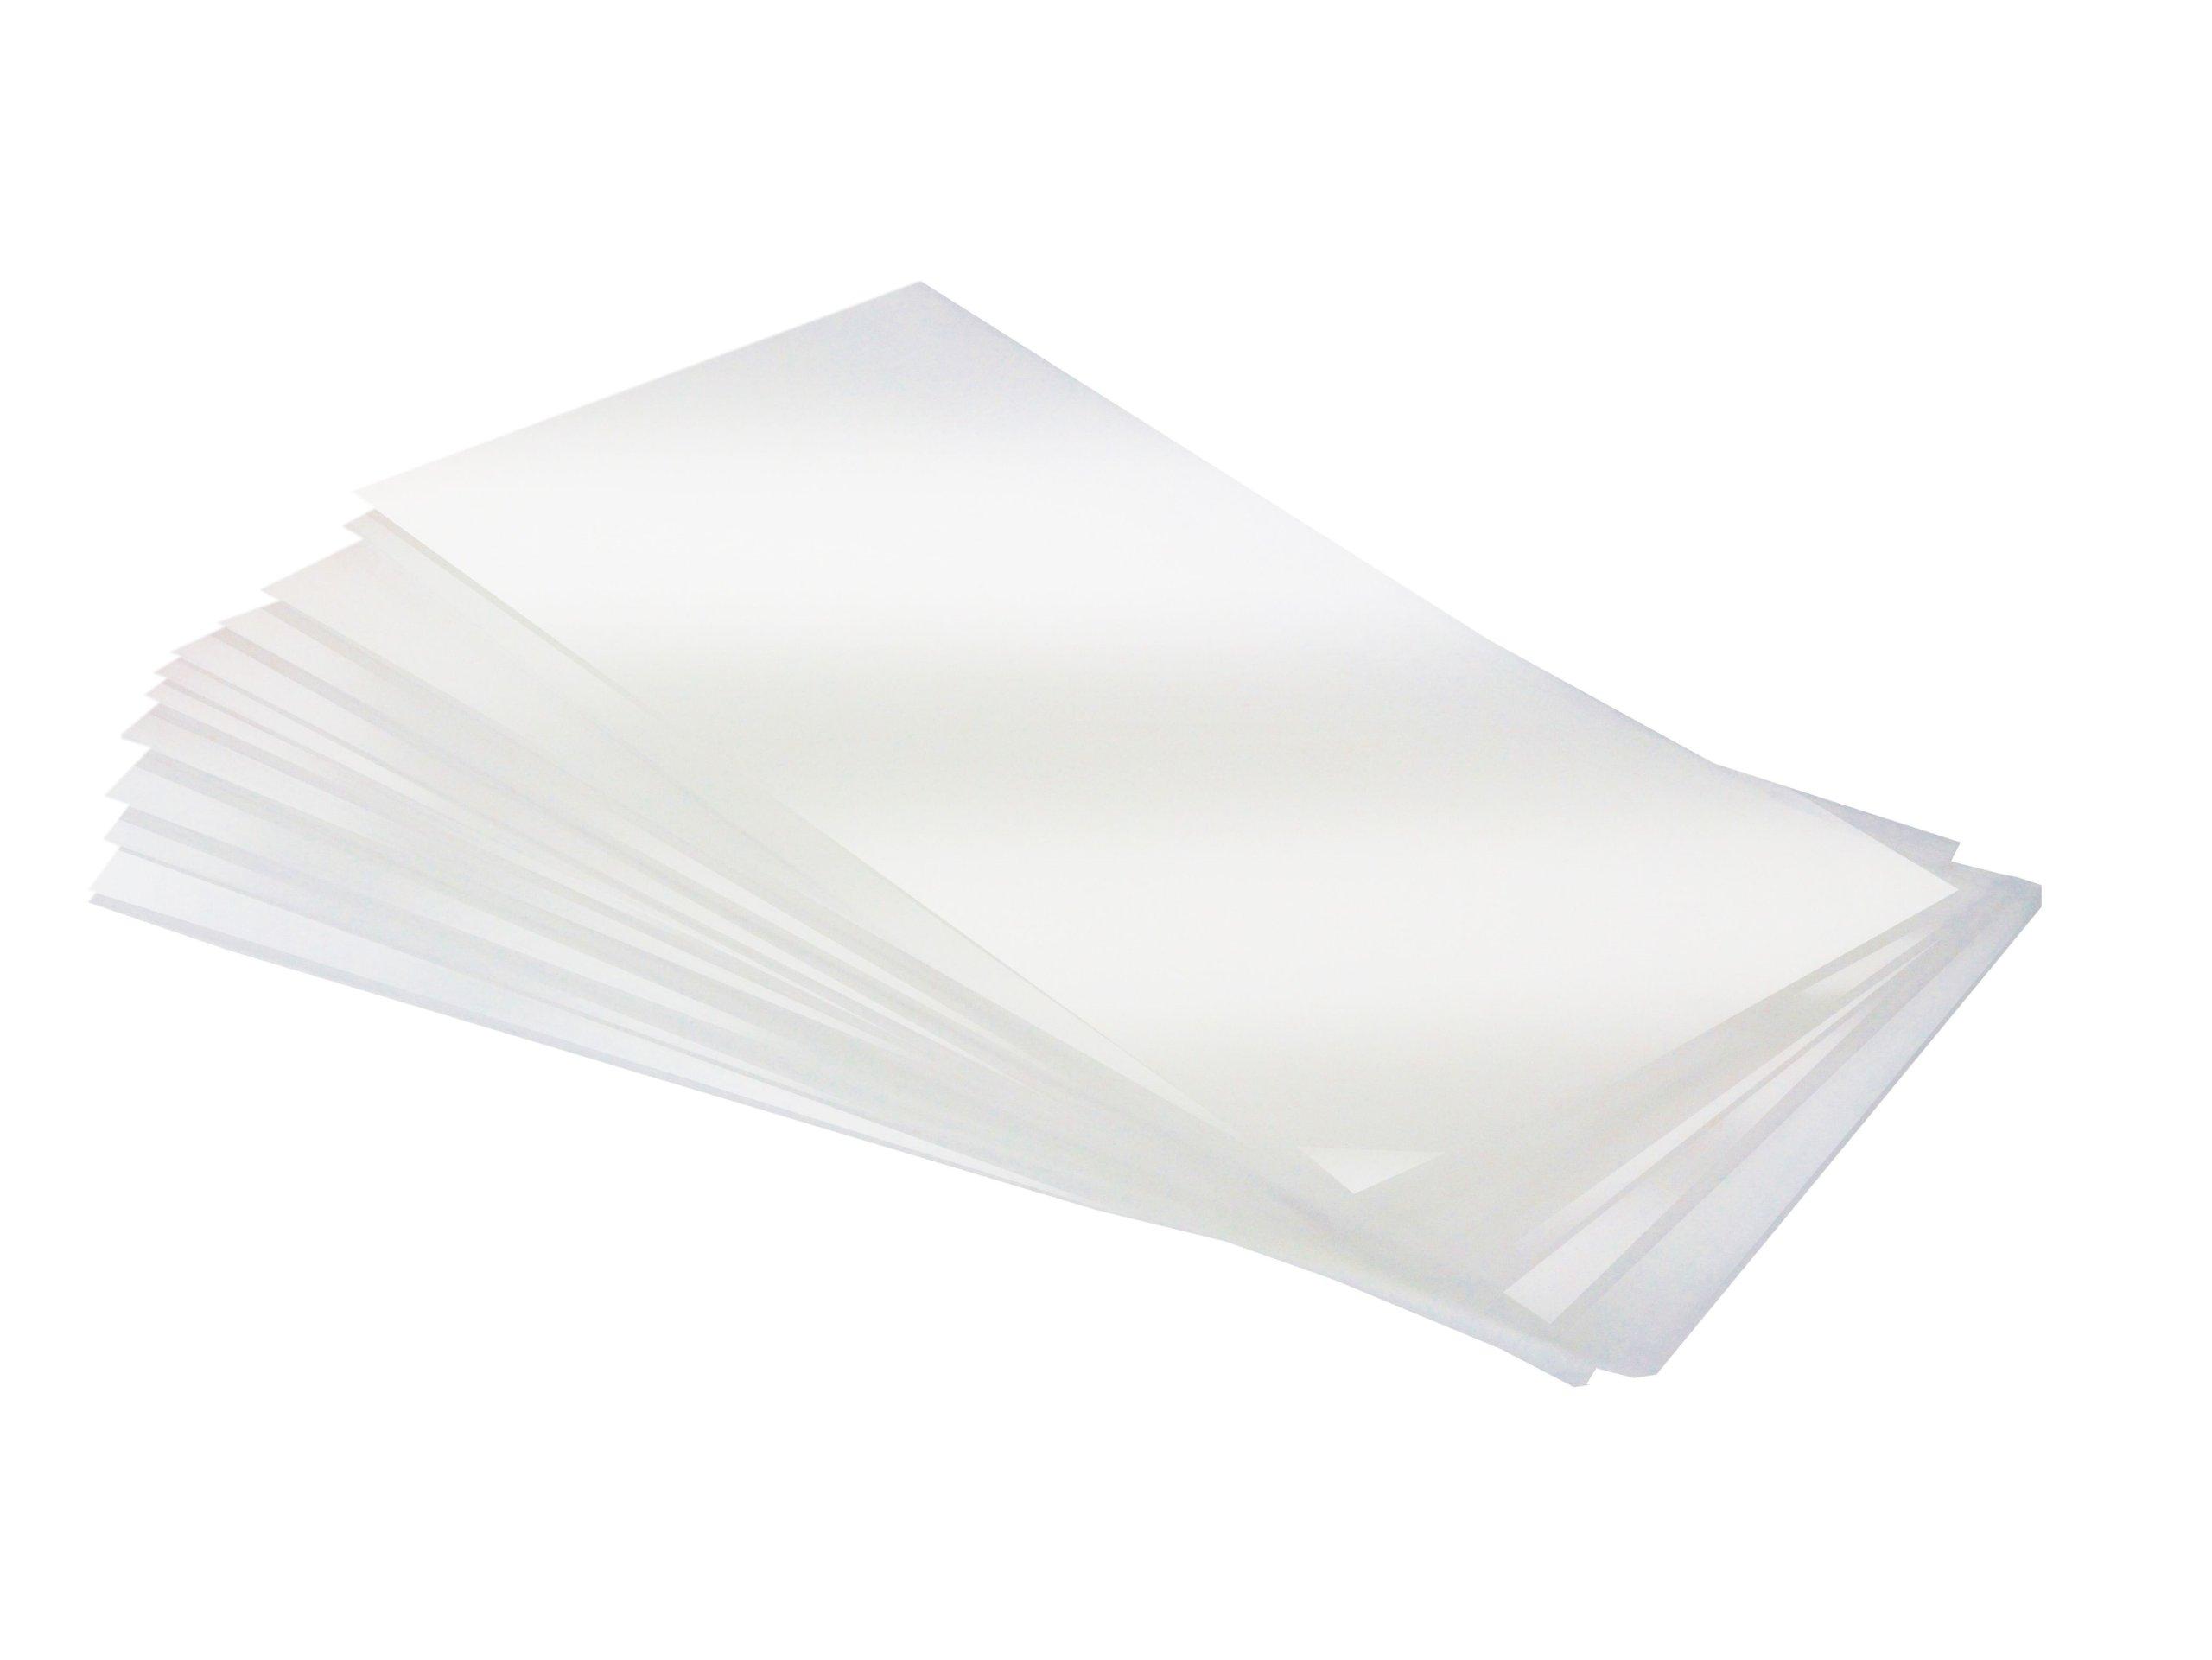 Пластиковые пакеты целлофановые пакеты PP 12x18 100